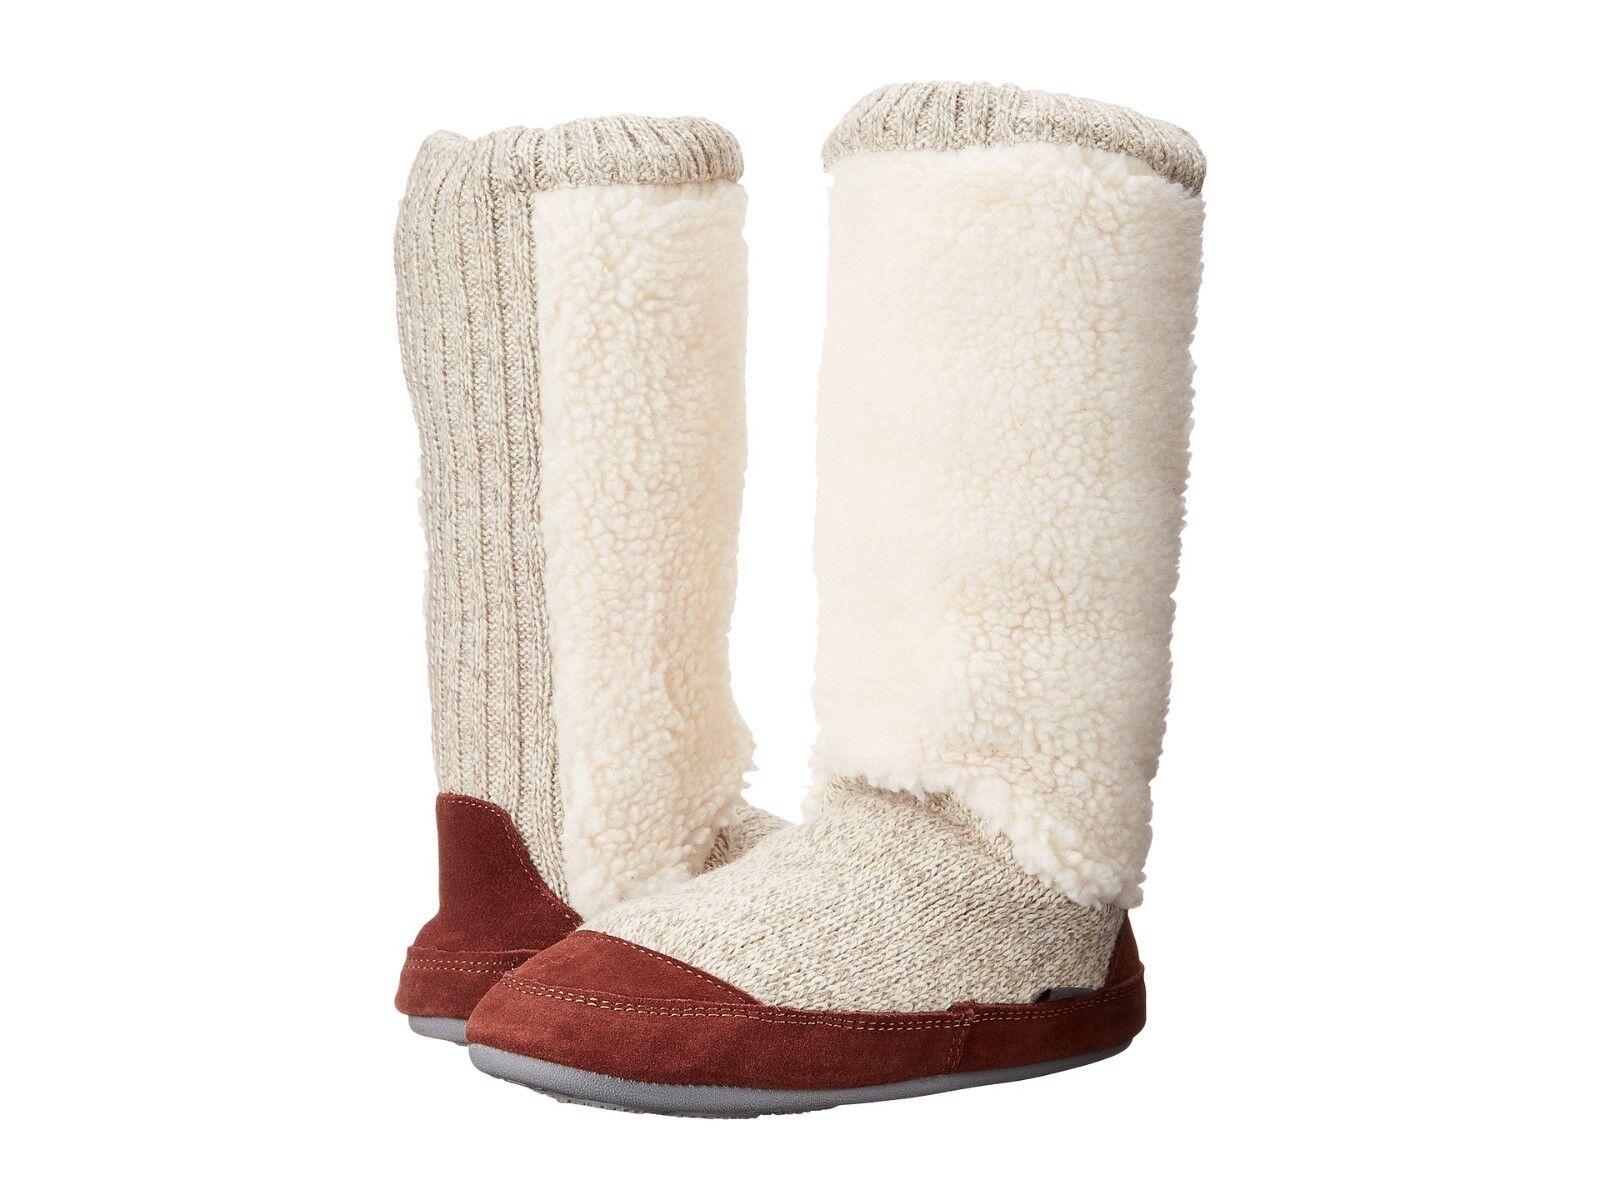 Acorn Slouch bota Buff Palomitas de Maíz Mediano (M, B)